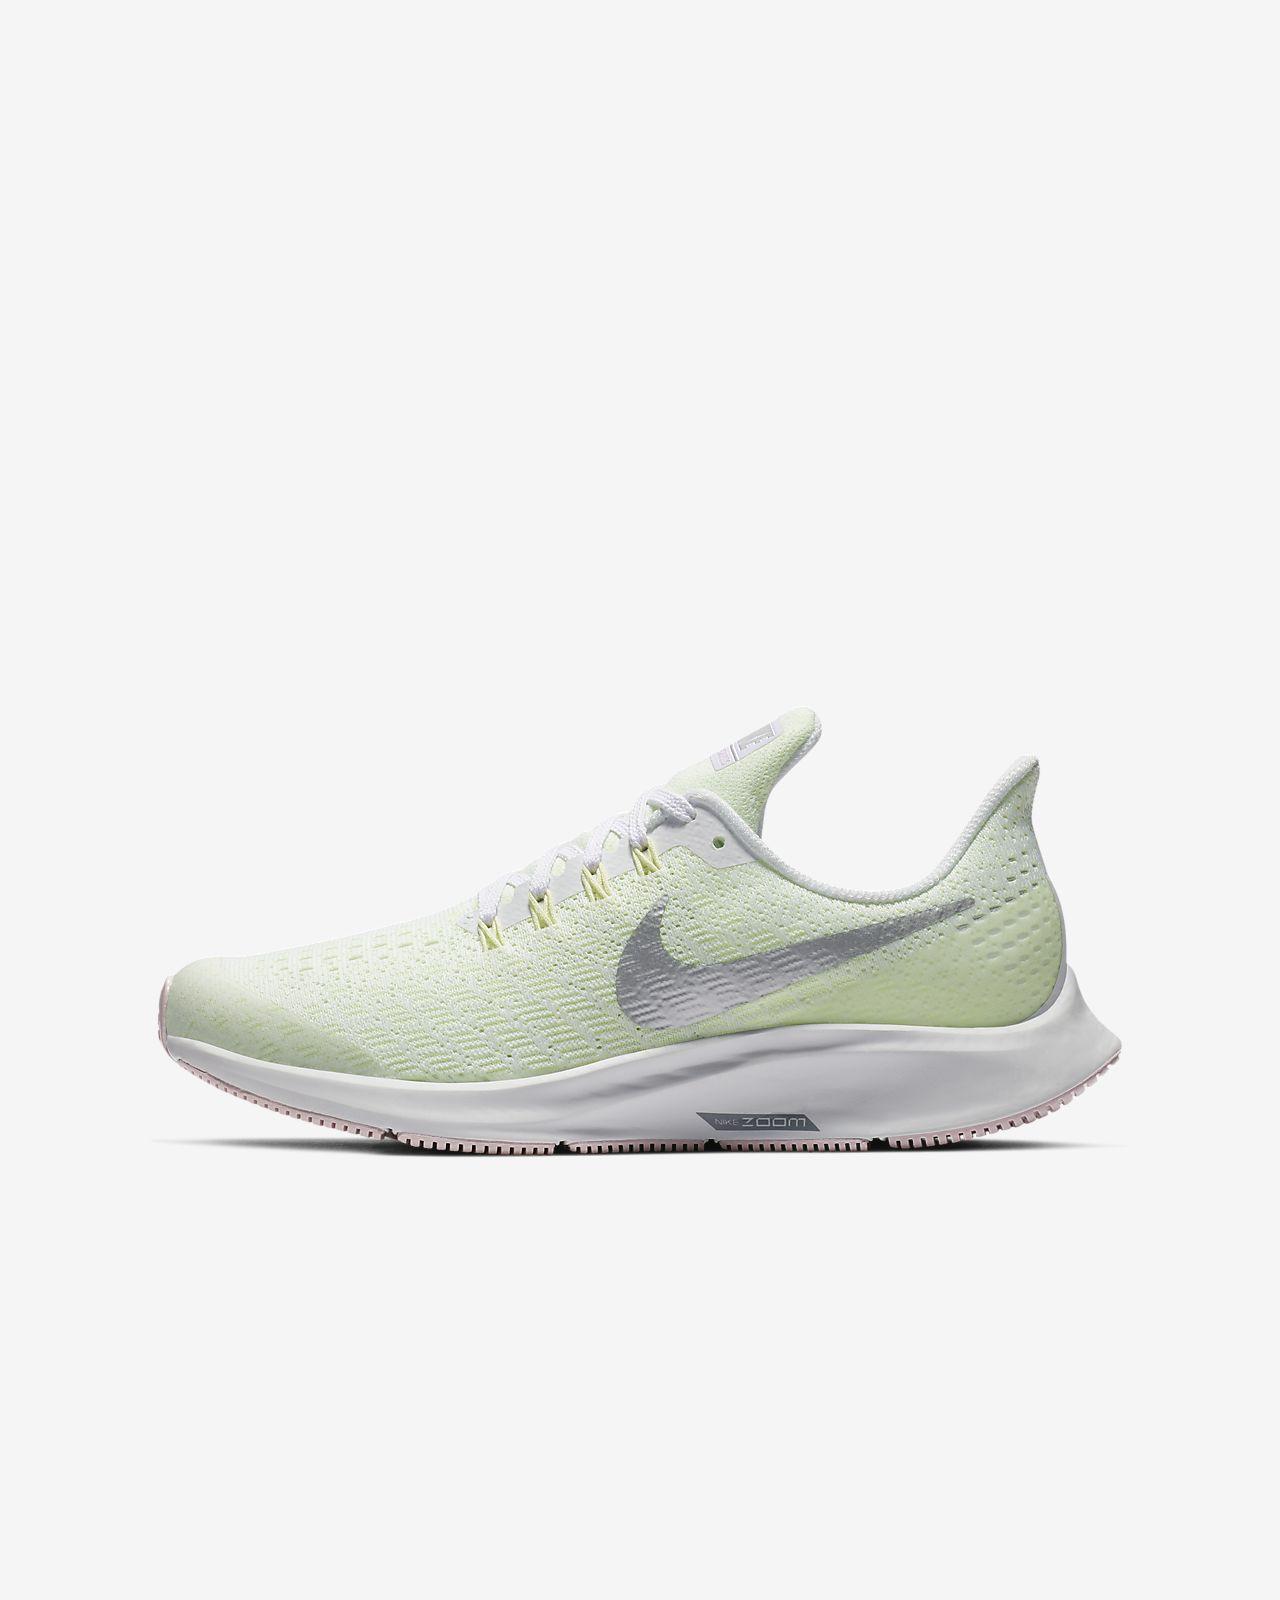 Löparsko Nike Air Zoom Pegasus 35 för barn/ungdom